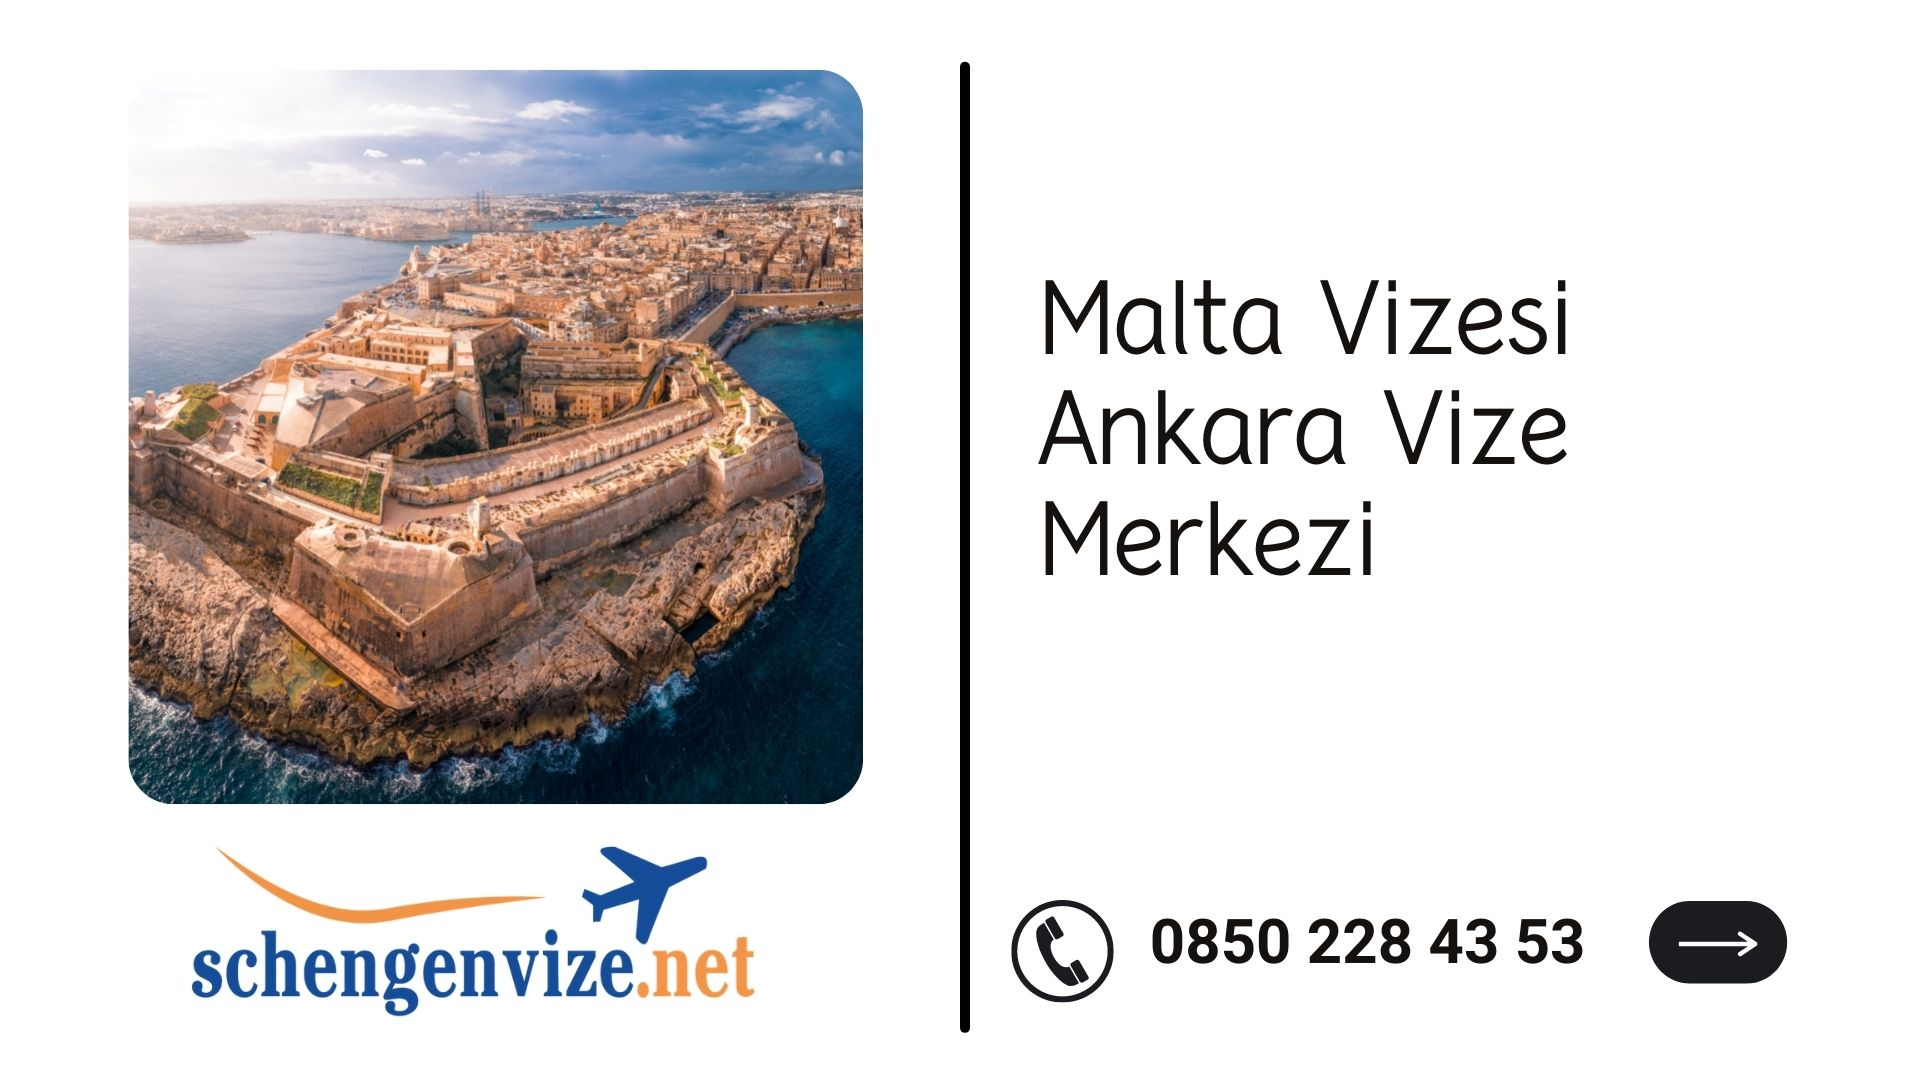 Malta Vizesi Ankara Vize Merkezi